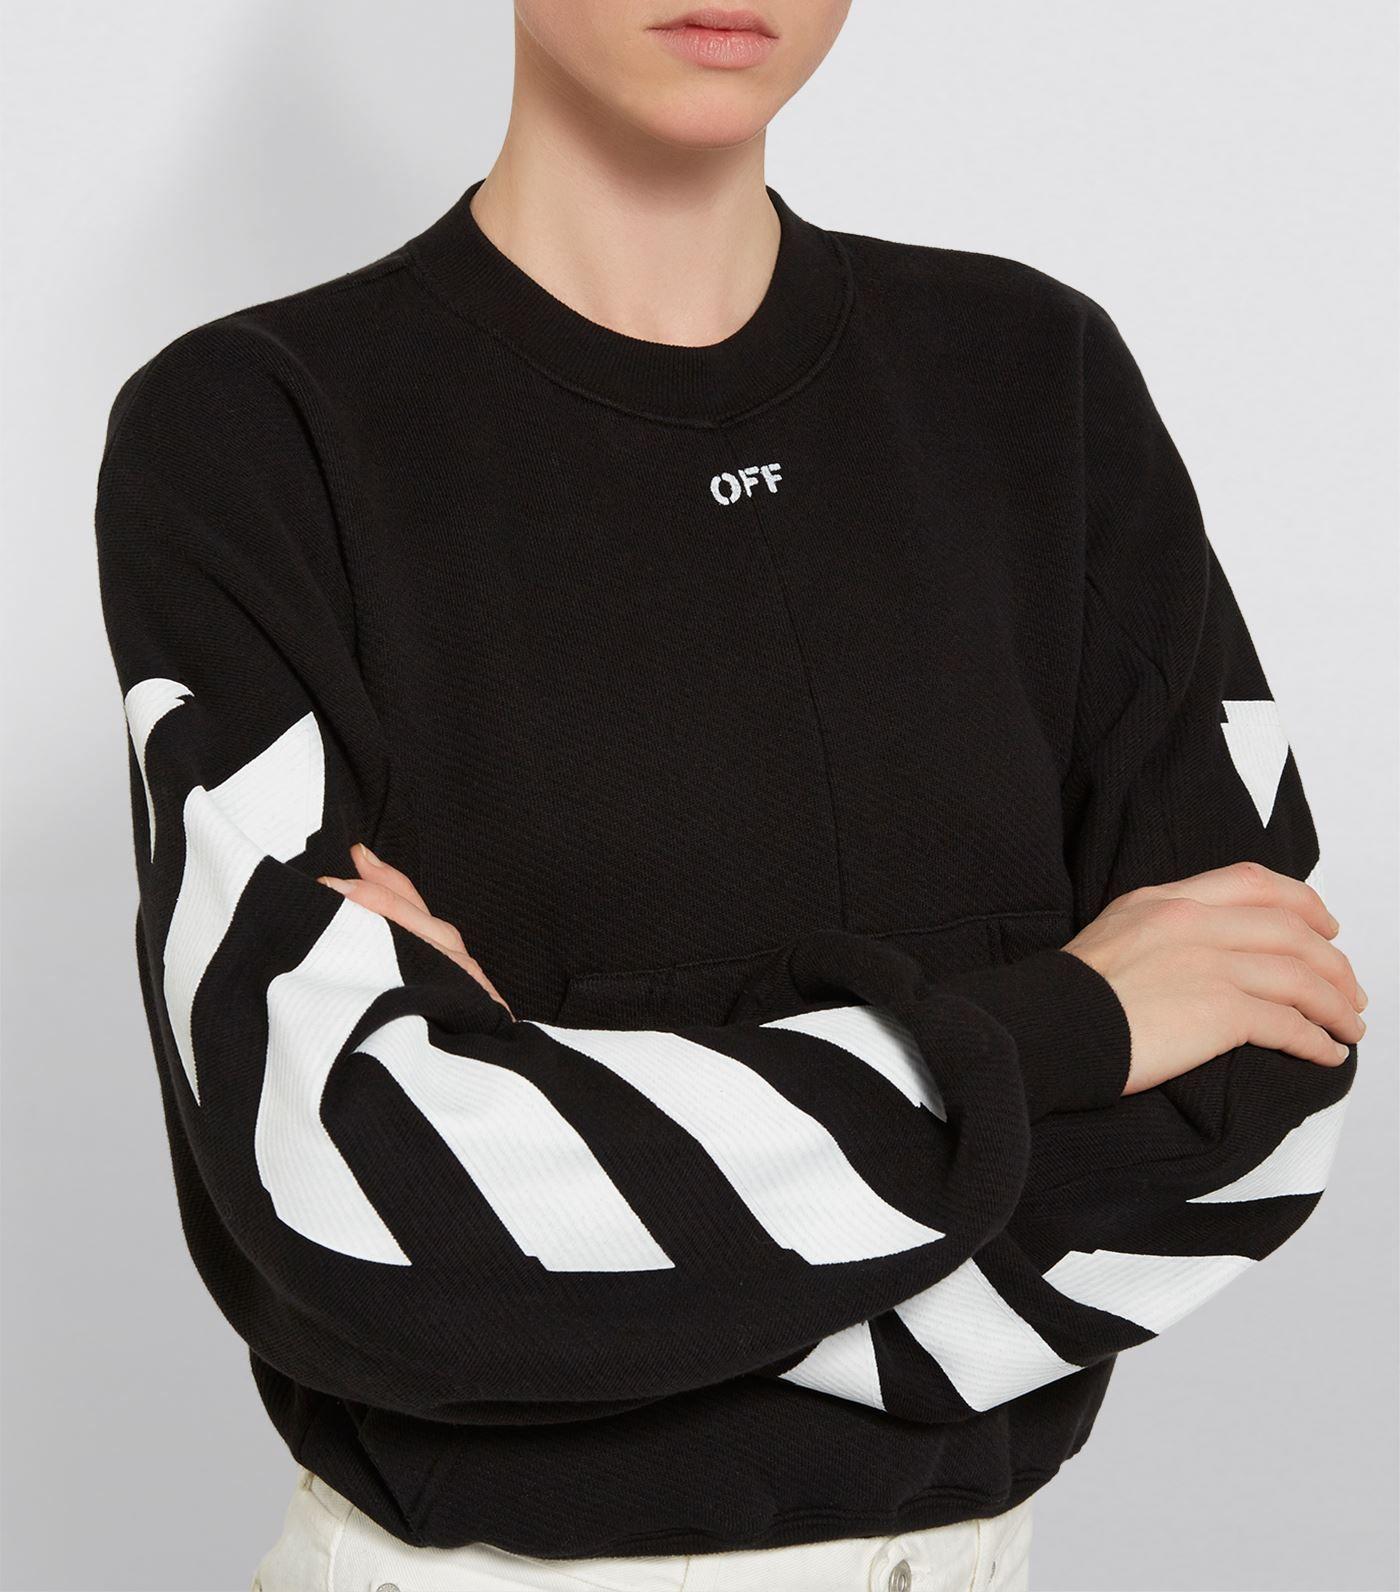 e6ab7a8b3c3 Off-White Diagonal Stencil Sweatshirt  AD